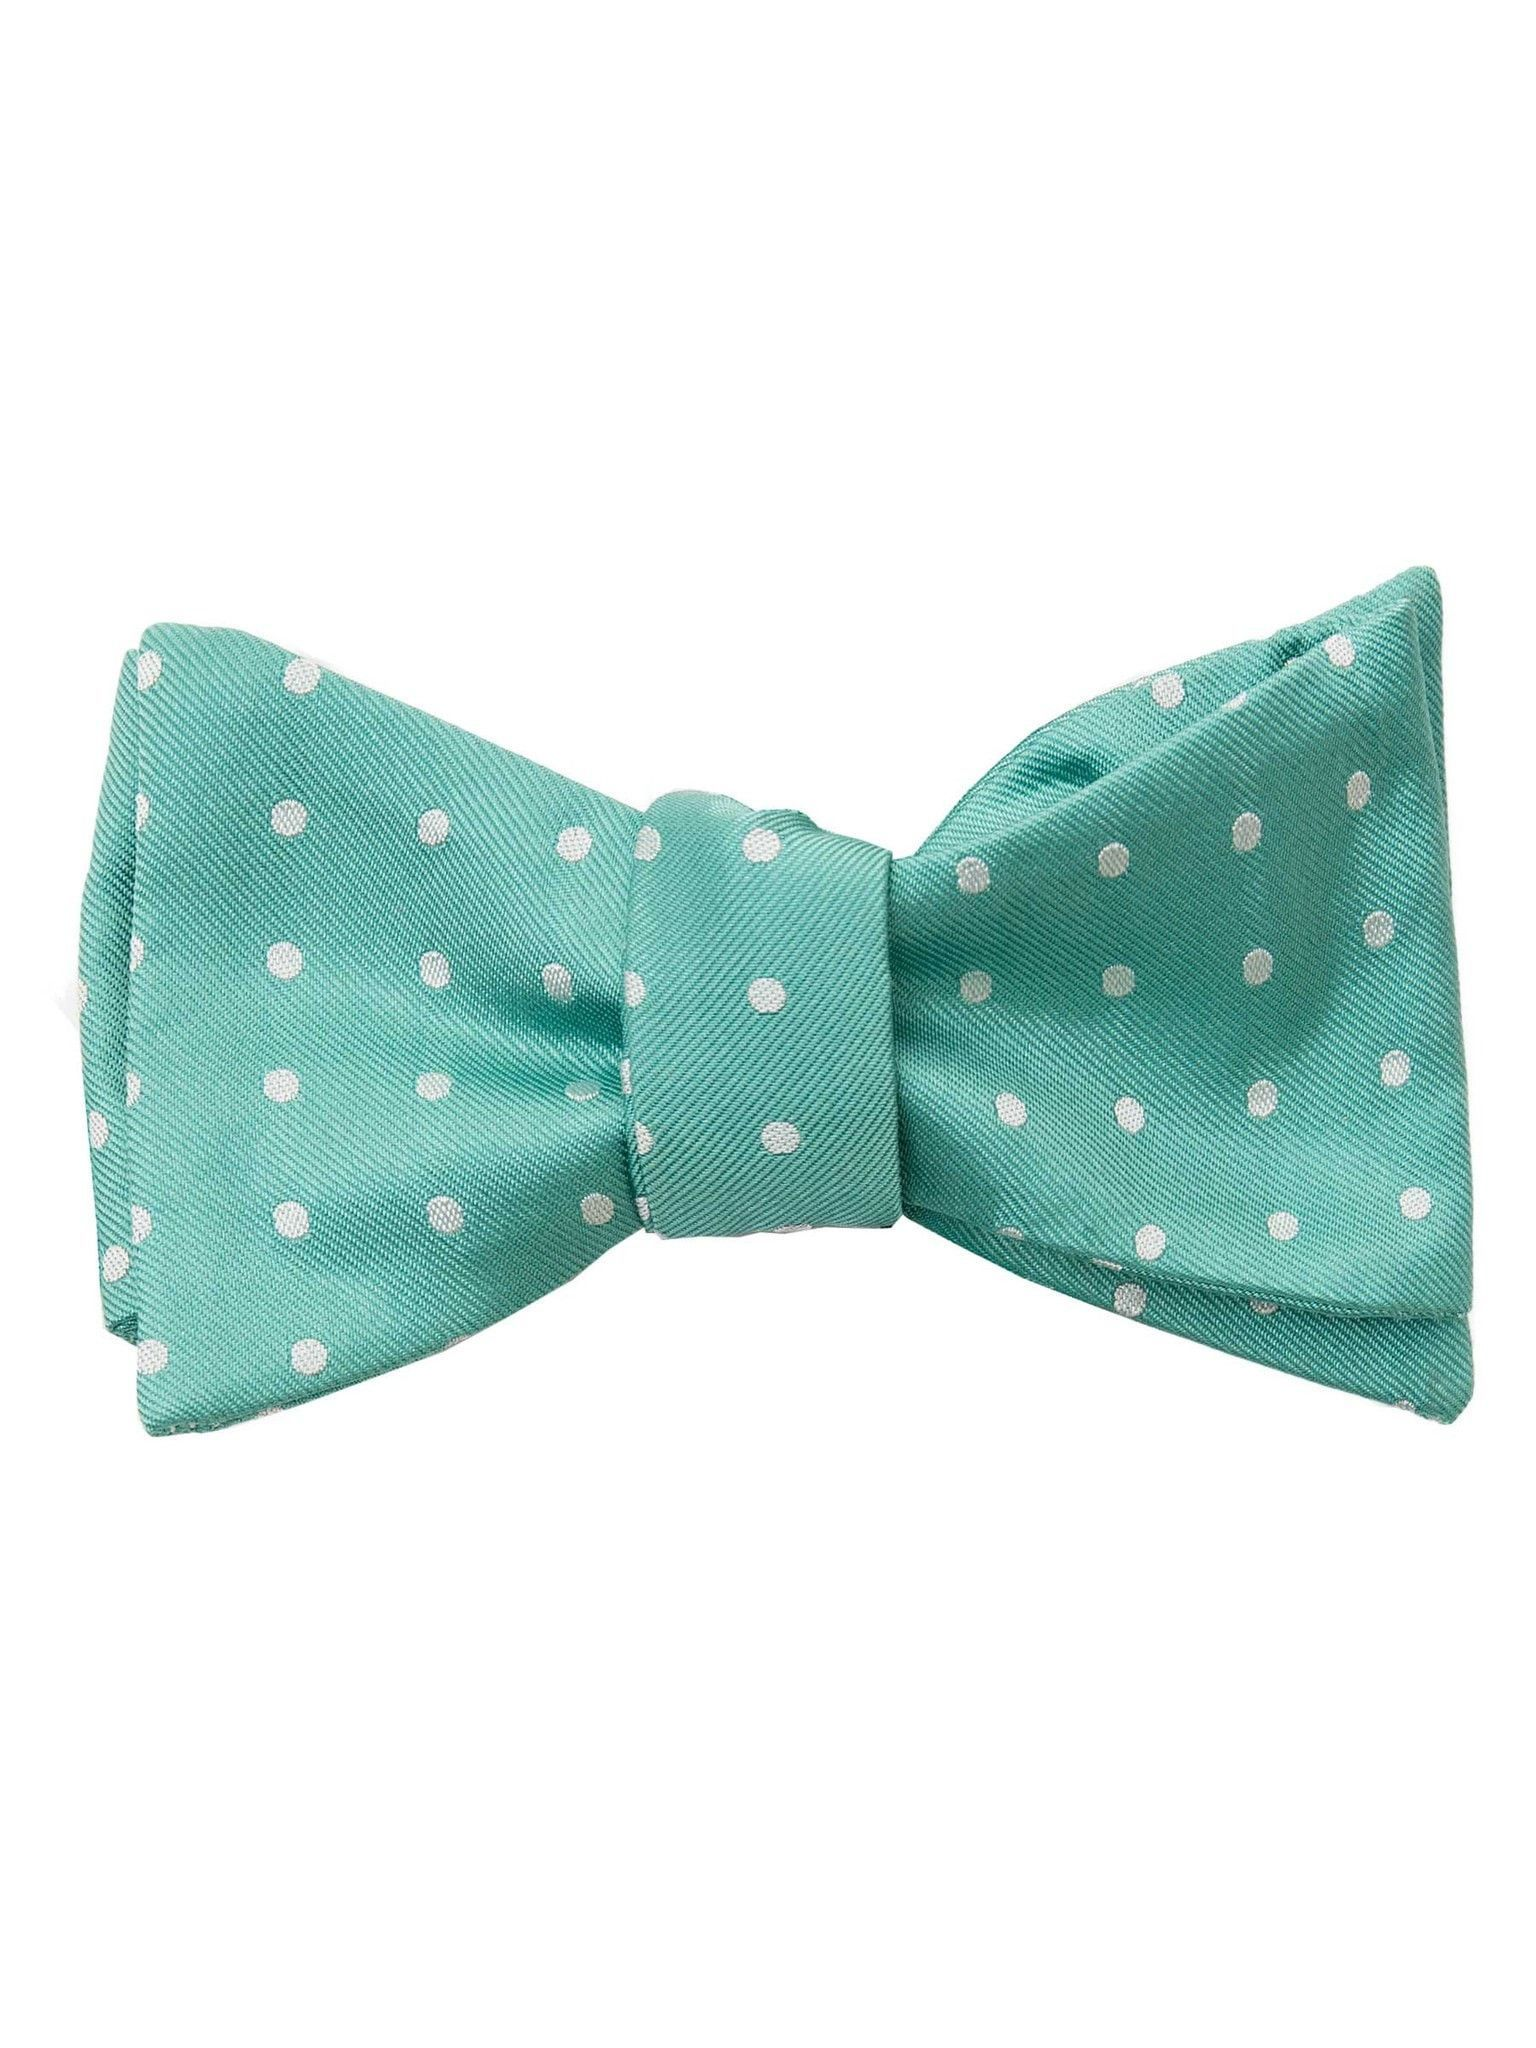 Silk Dot Green Self Tie Bow Tie